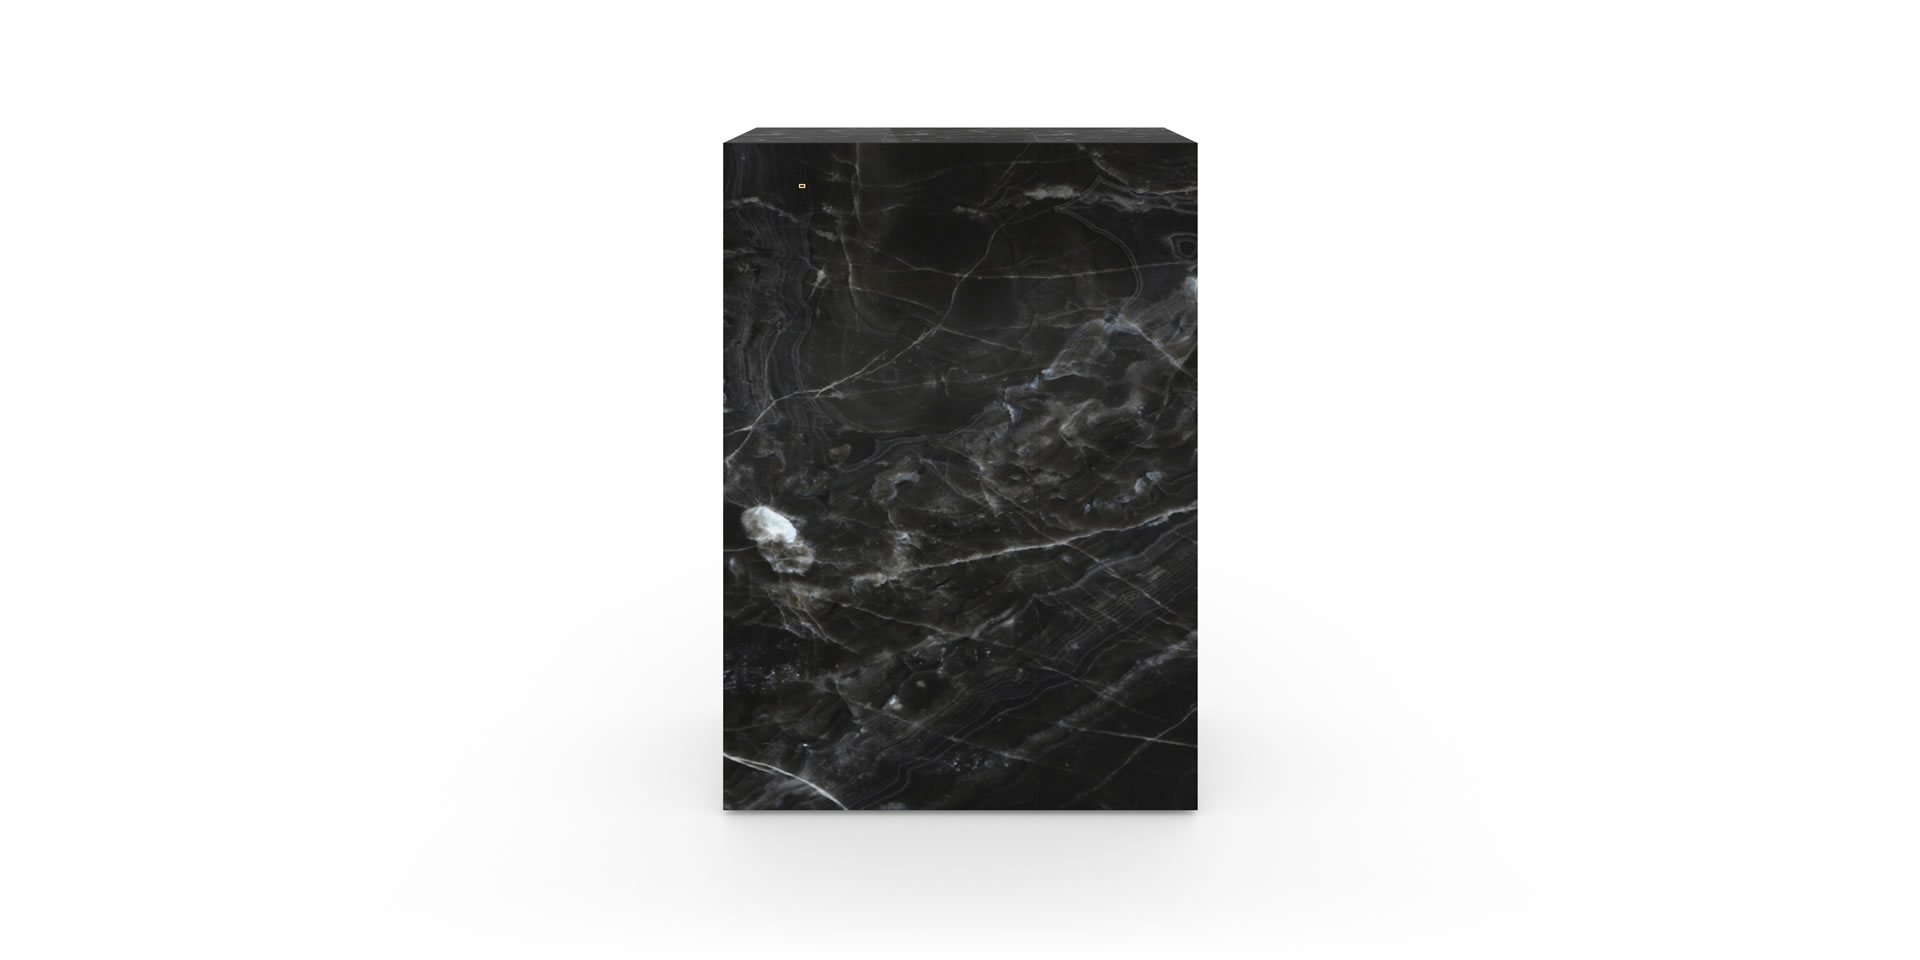 Cabinet Iii Vi Marble Black Felix Schwake